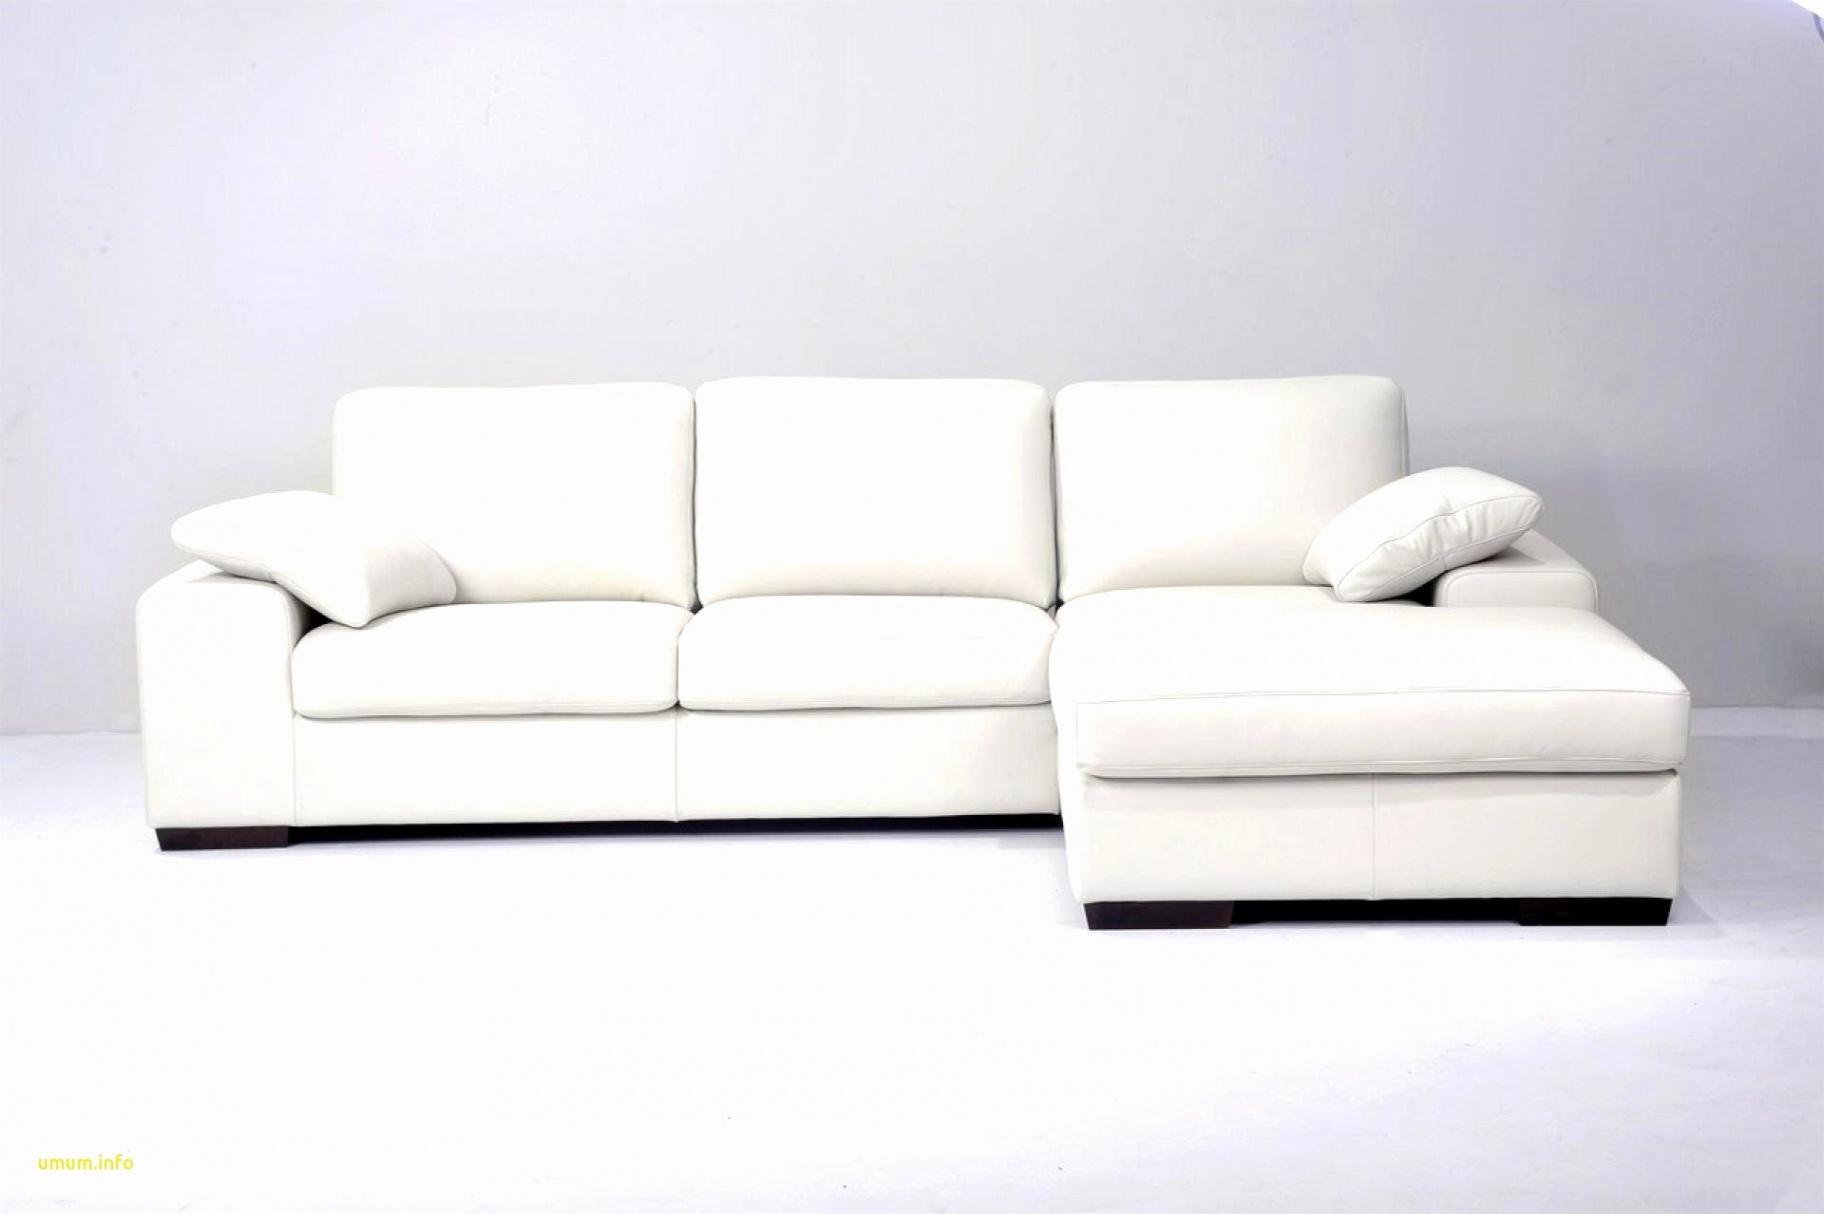 Canapé Ikea Convertible Angle Inspirant Galerie Canapé 3 Places Cuir — Laguerredesmots